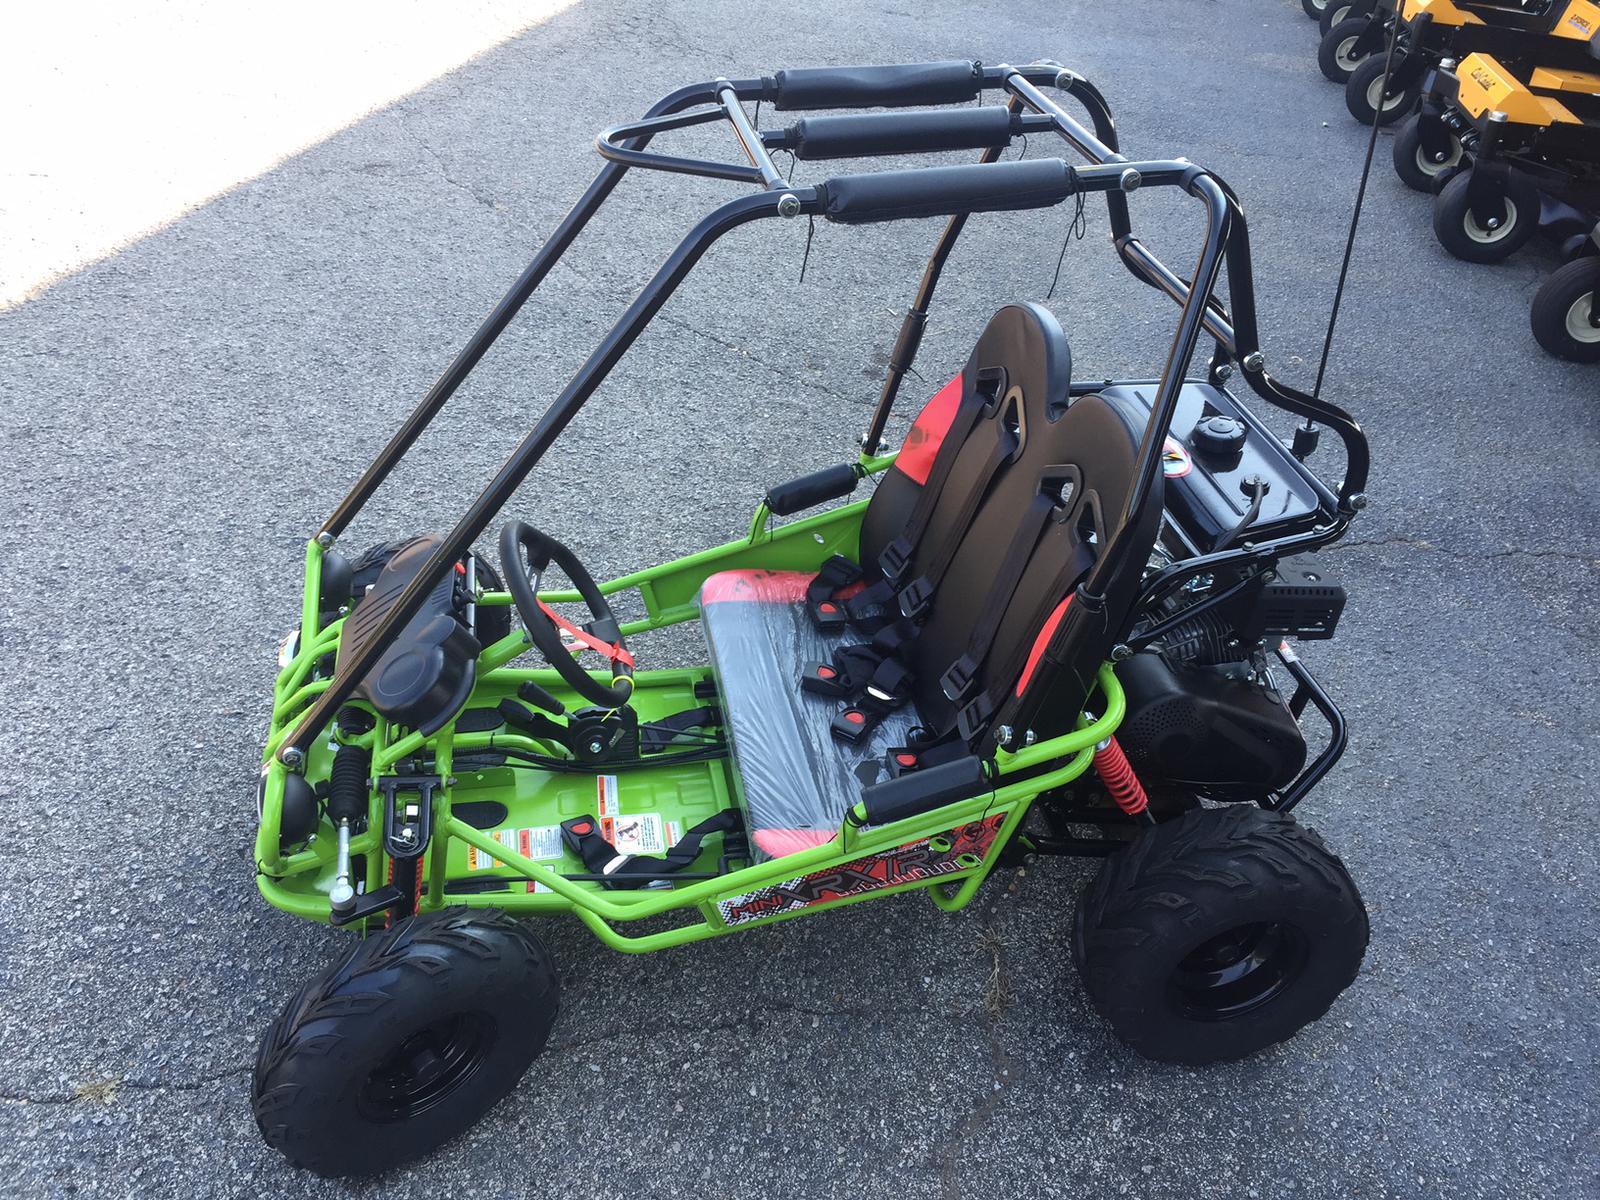 Go-Kart from TrailMaster Ferrell's Home & Outdoor